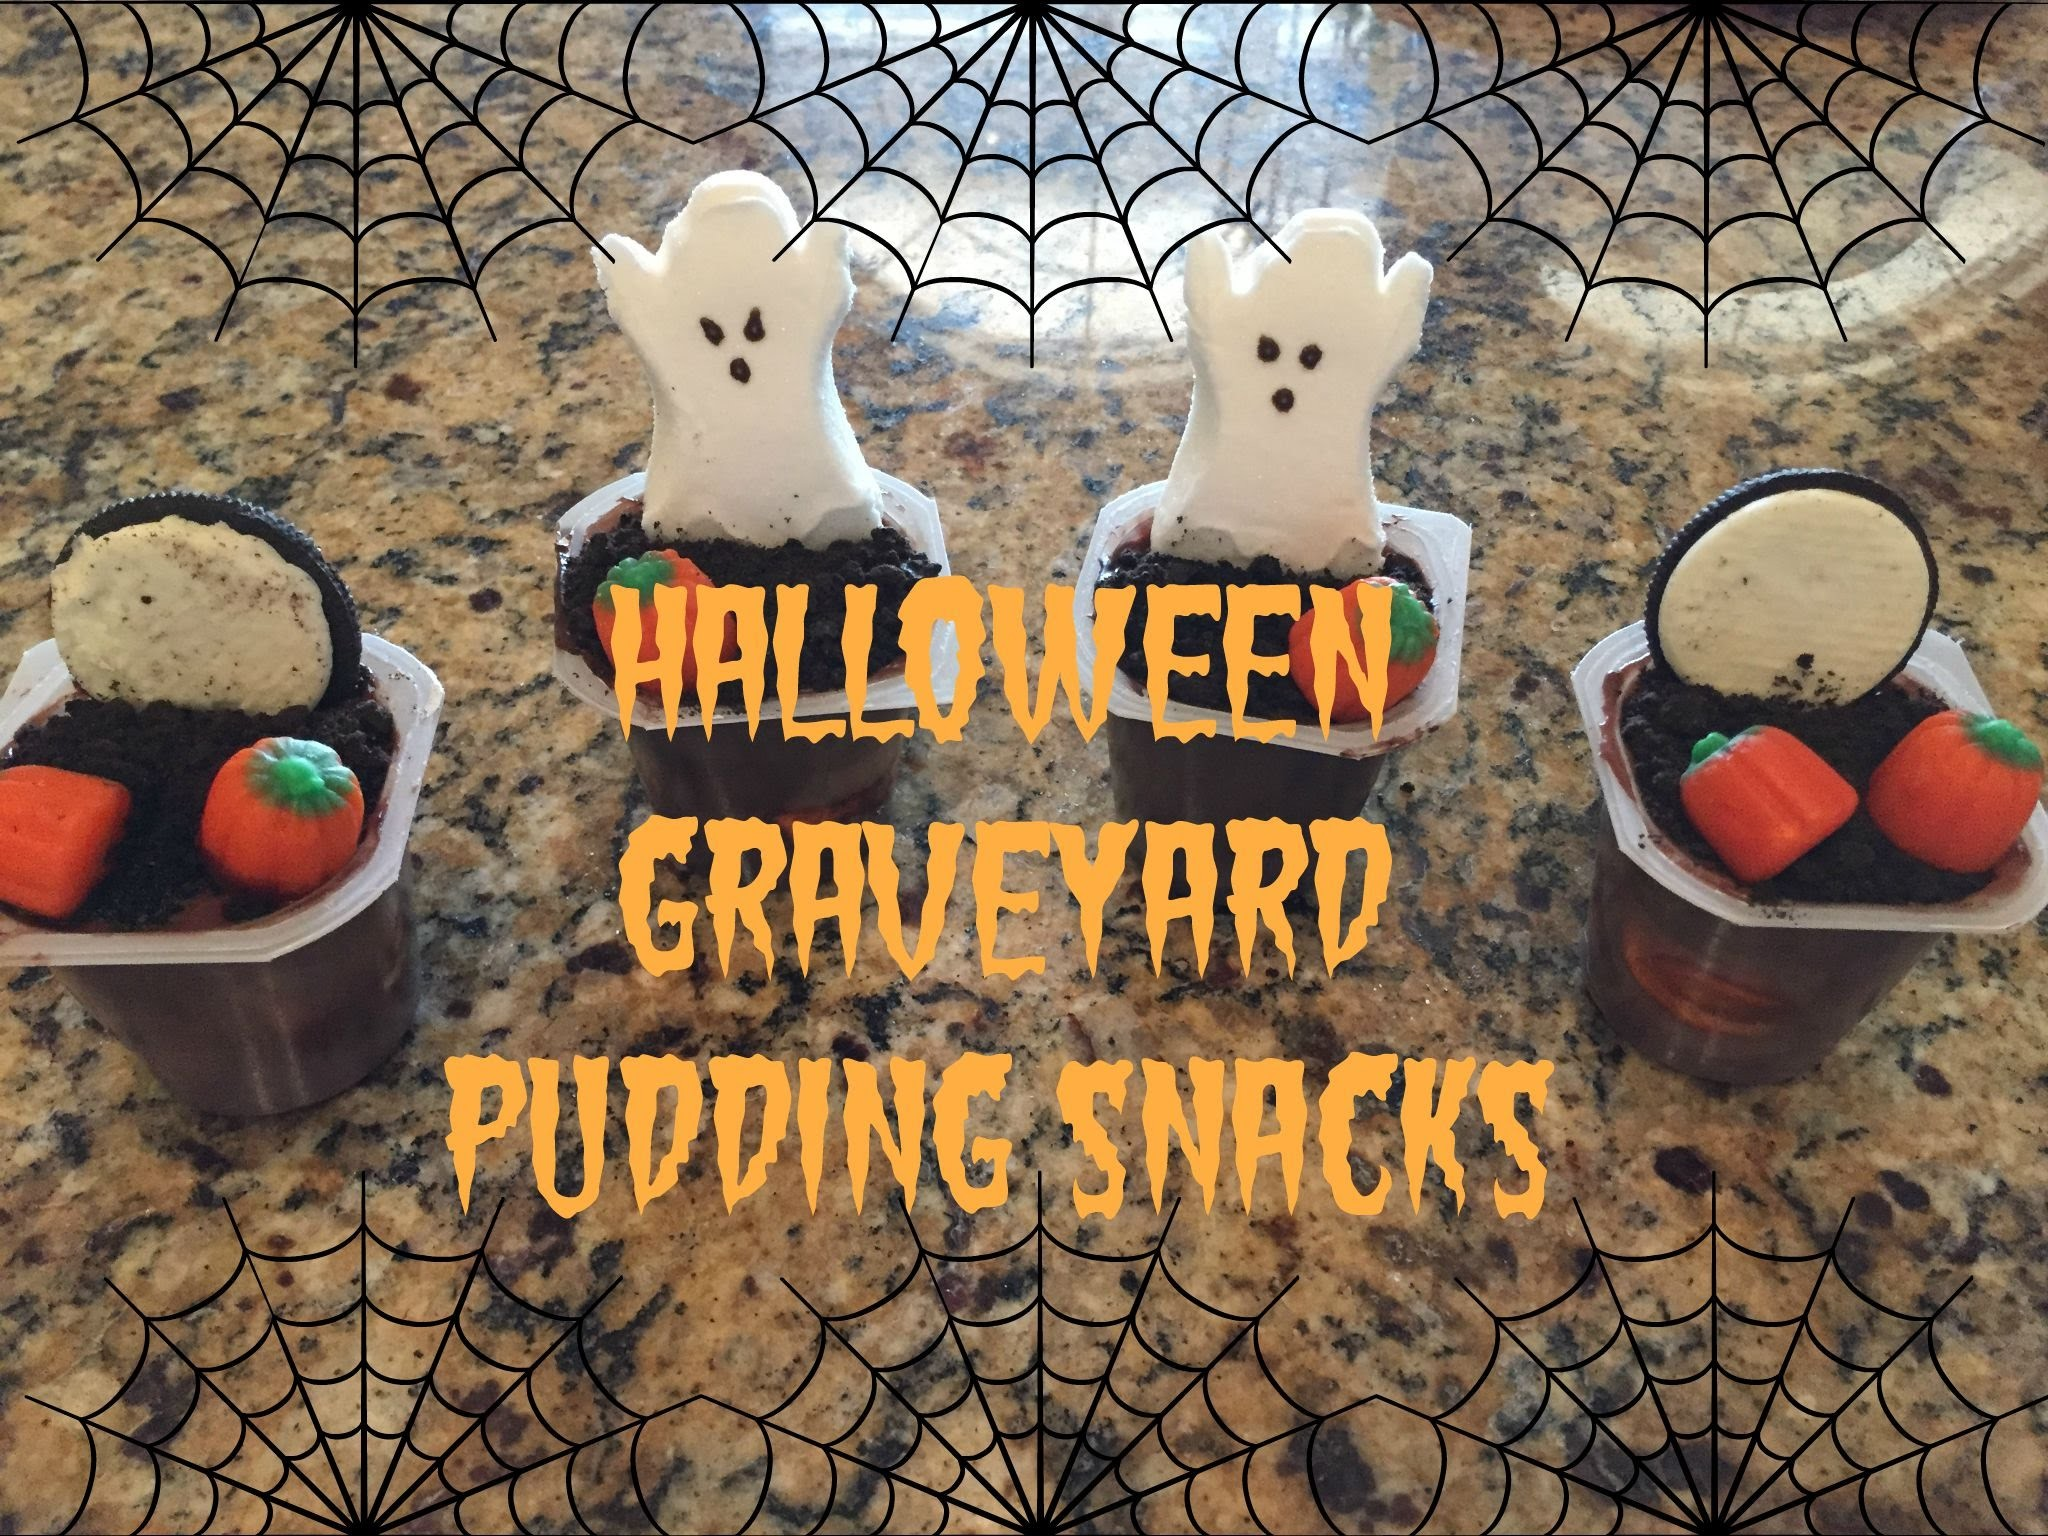 Halloween Graveyard Pudding Tutorial